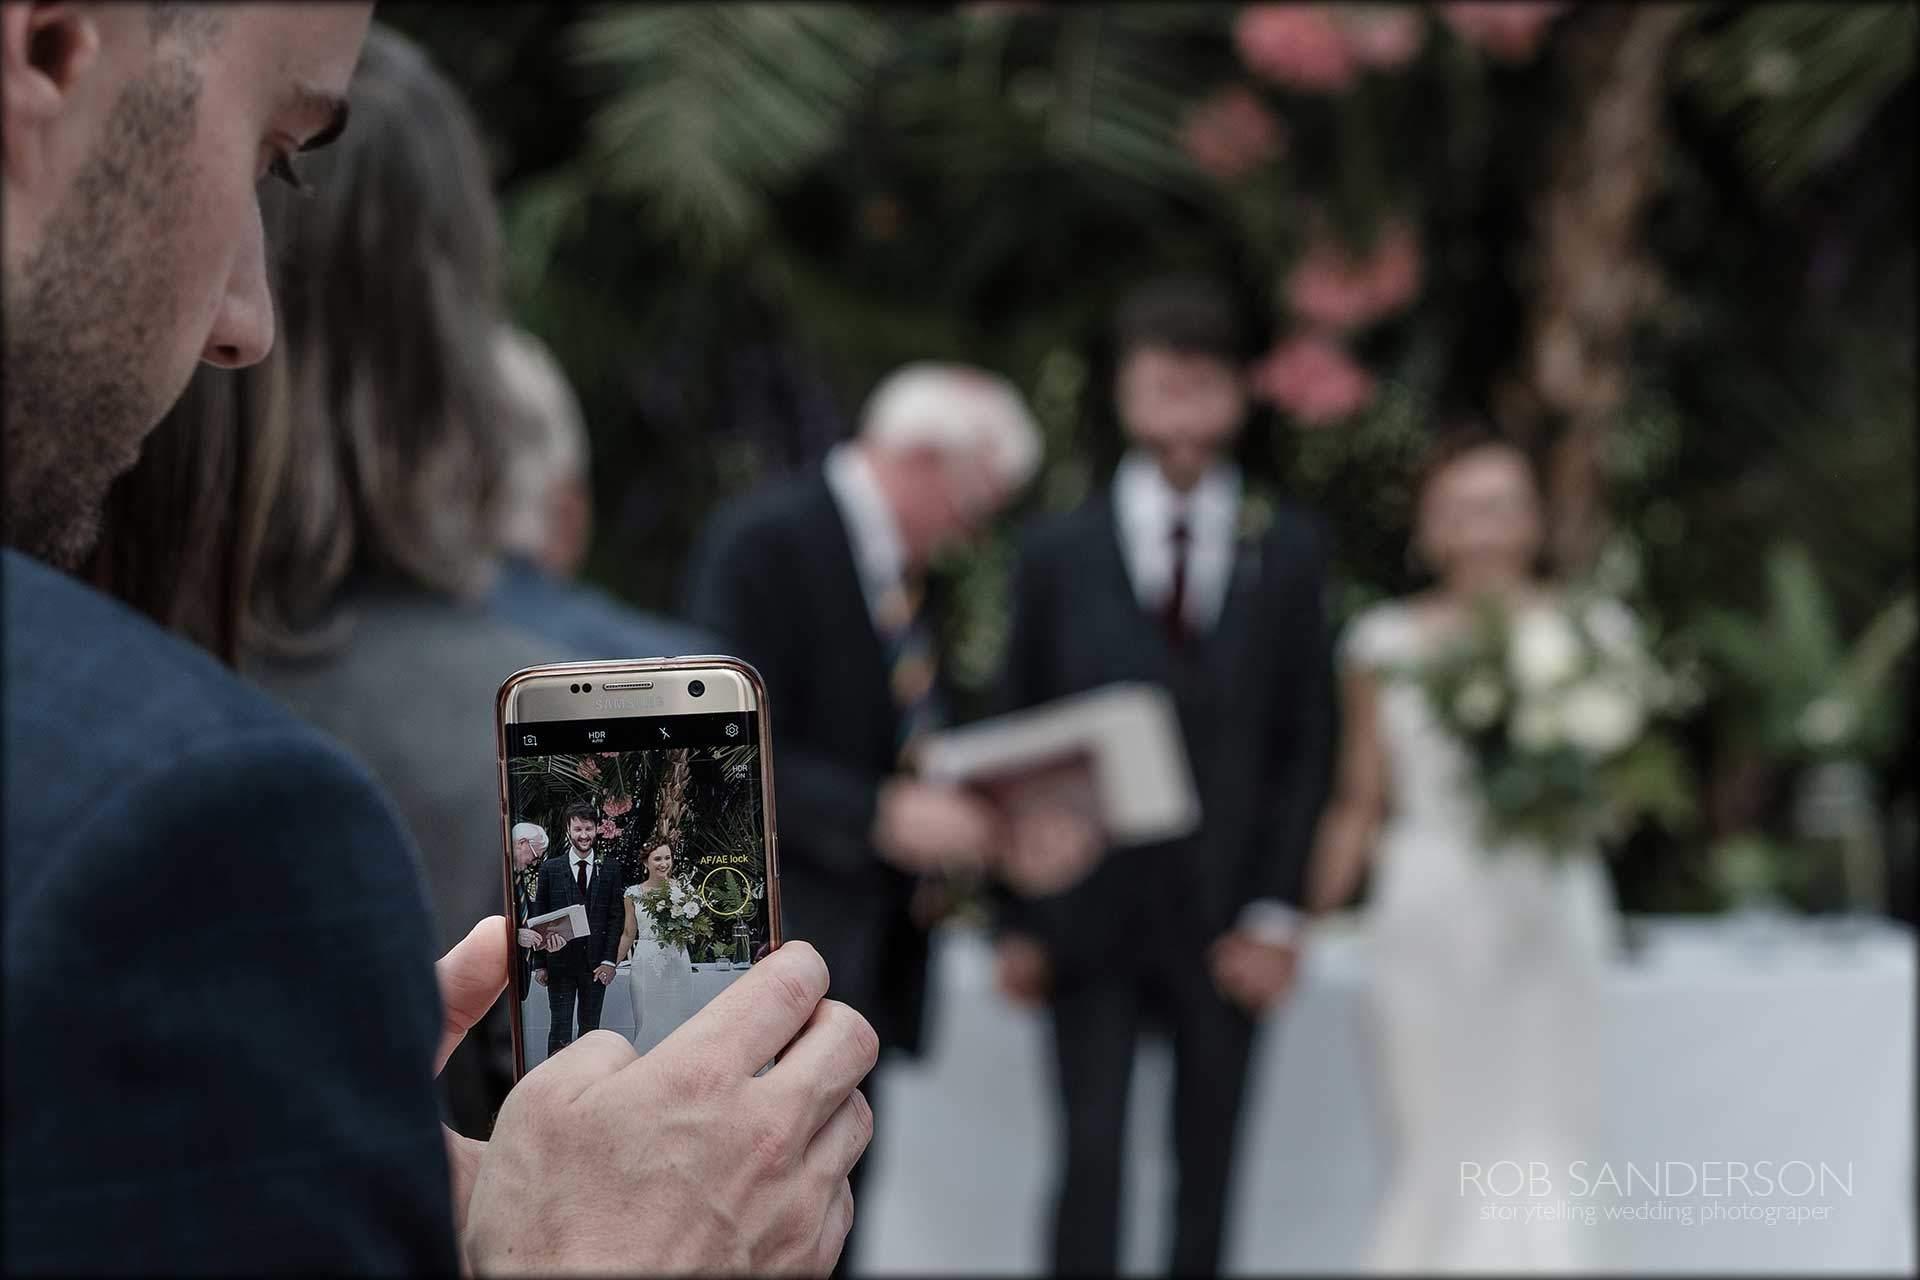 mobile phone wedding photography